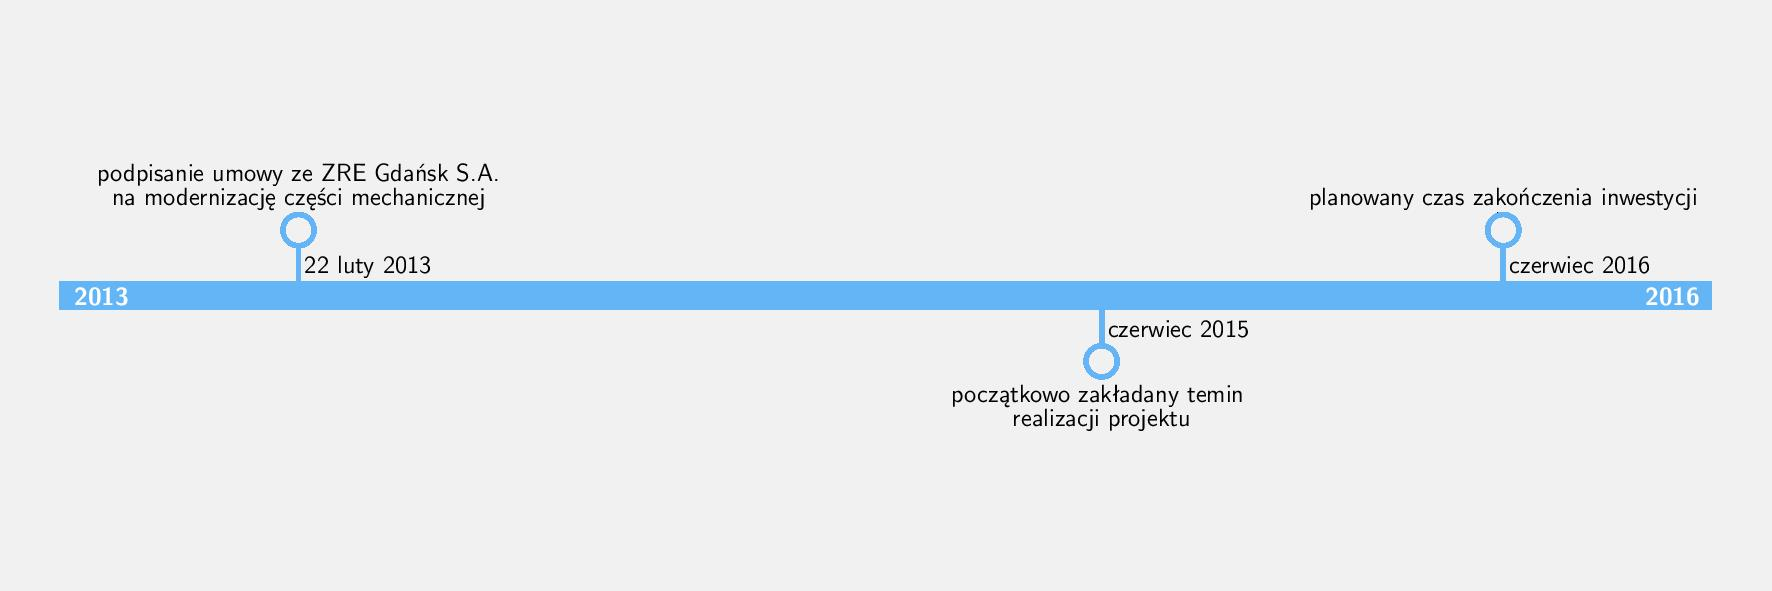 Roboczy-page-002